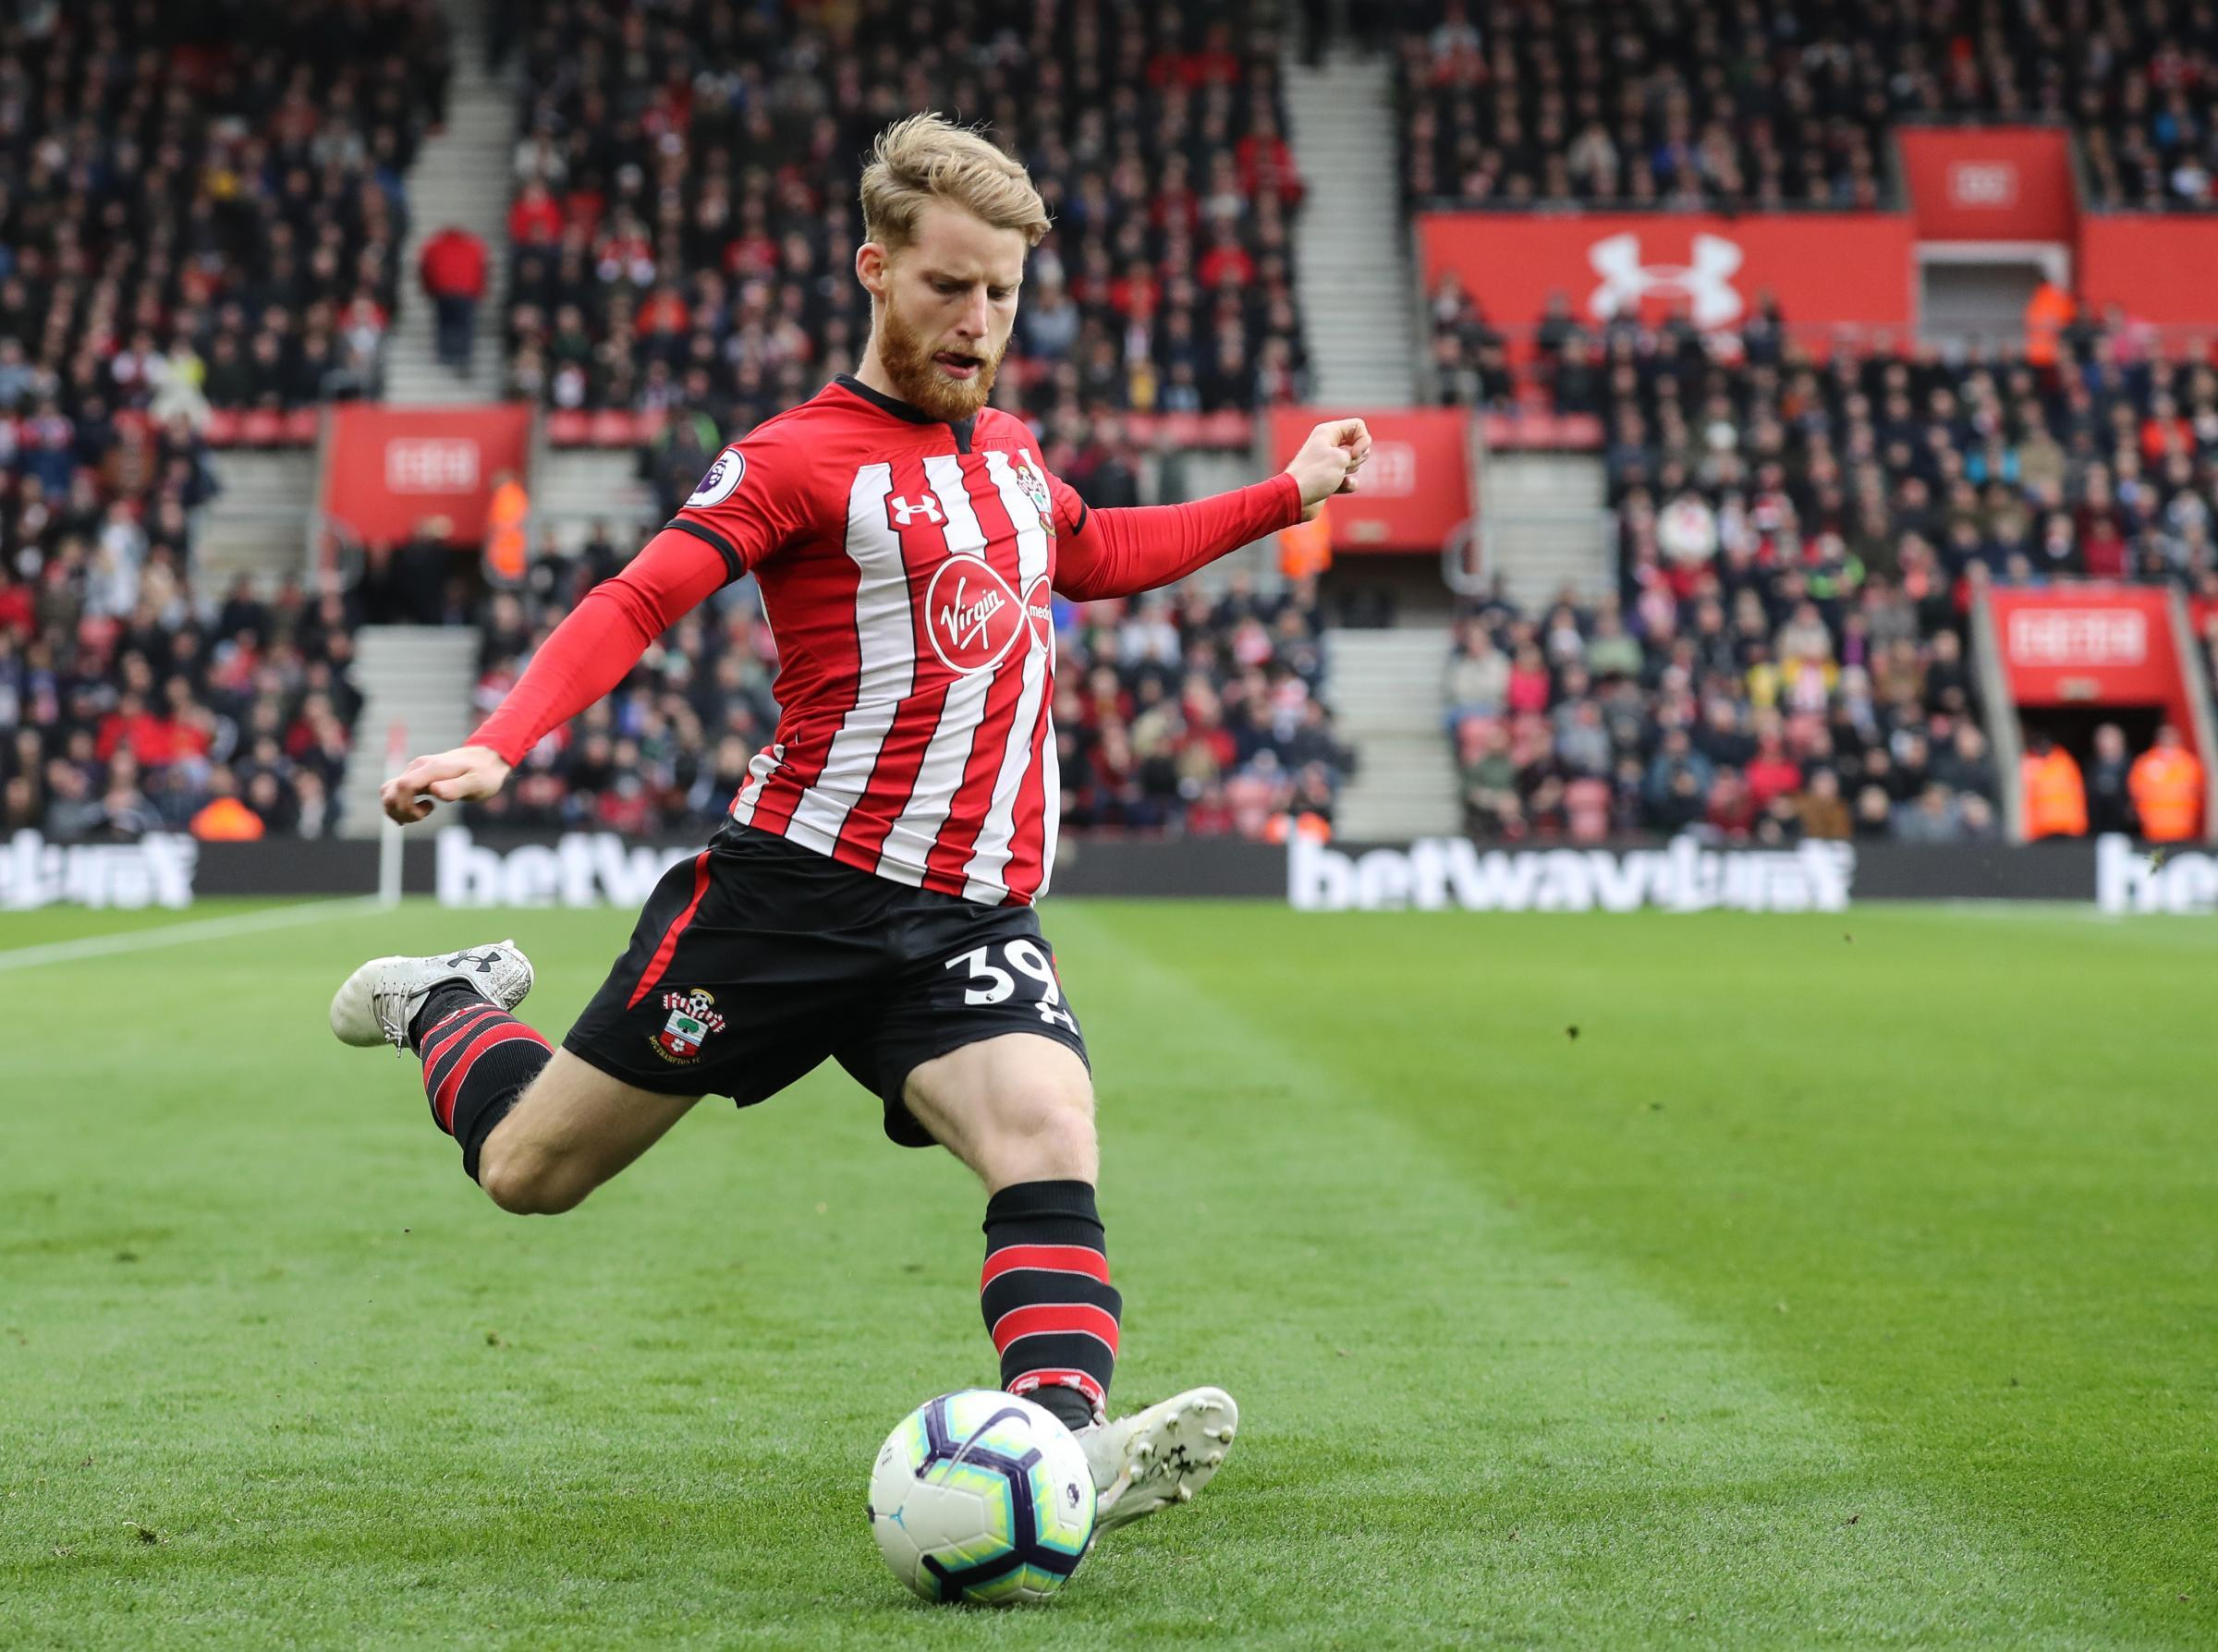 Southampton loanee Josh Sims talks about his move to America